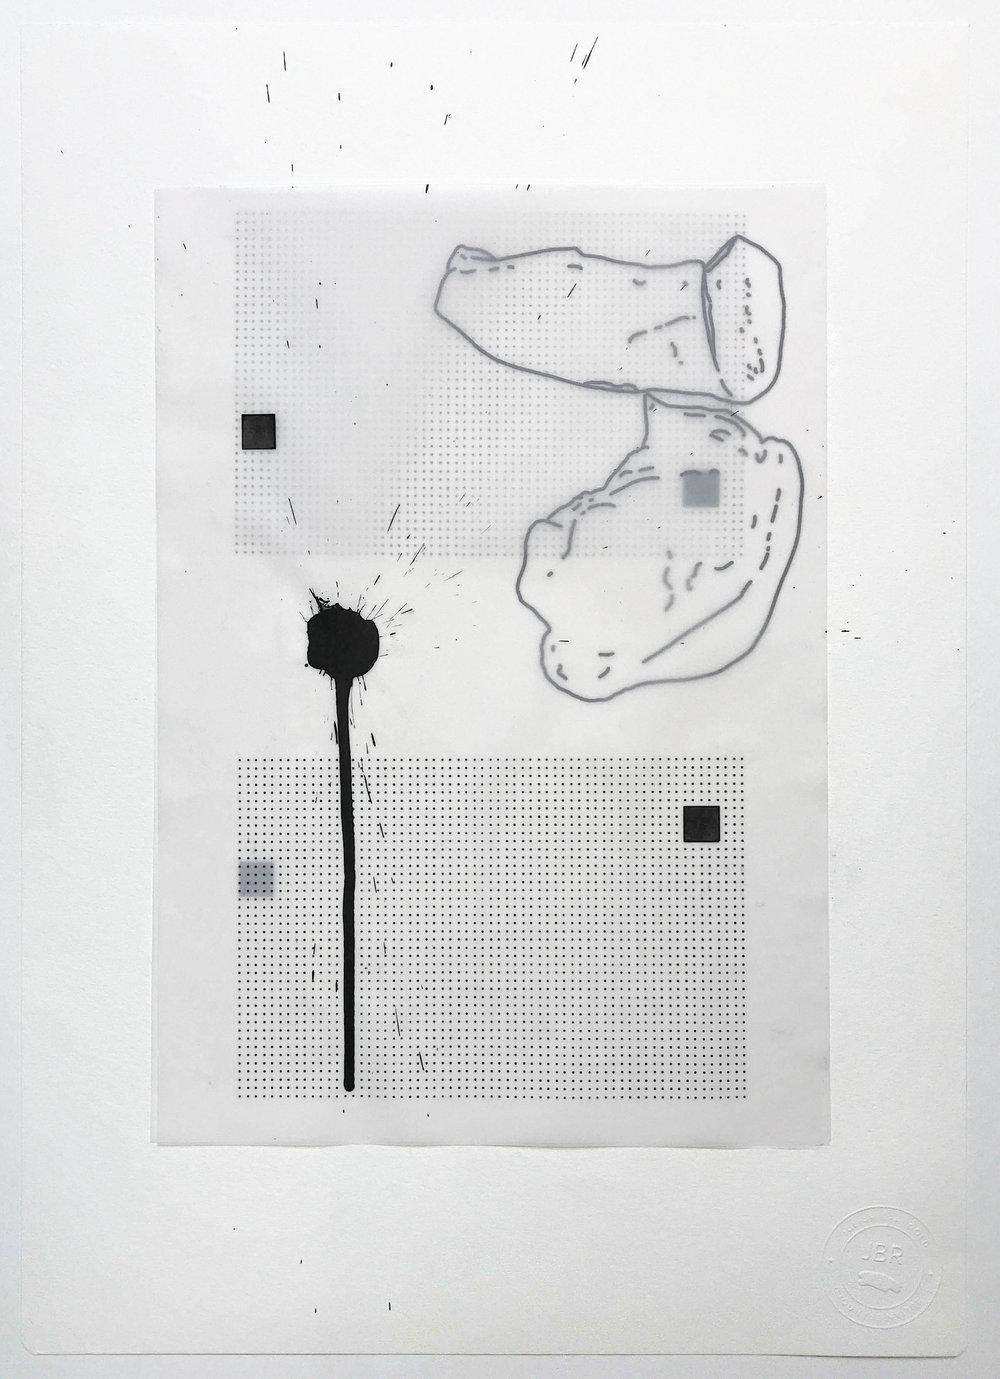 %22Quiebre parejo desparejo%22- Técnica mixta  - 42 x 30 cm - Julián Brangold - 2018.jpg